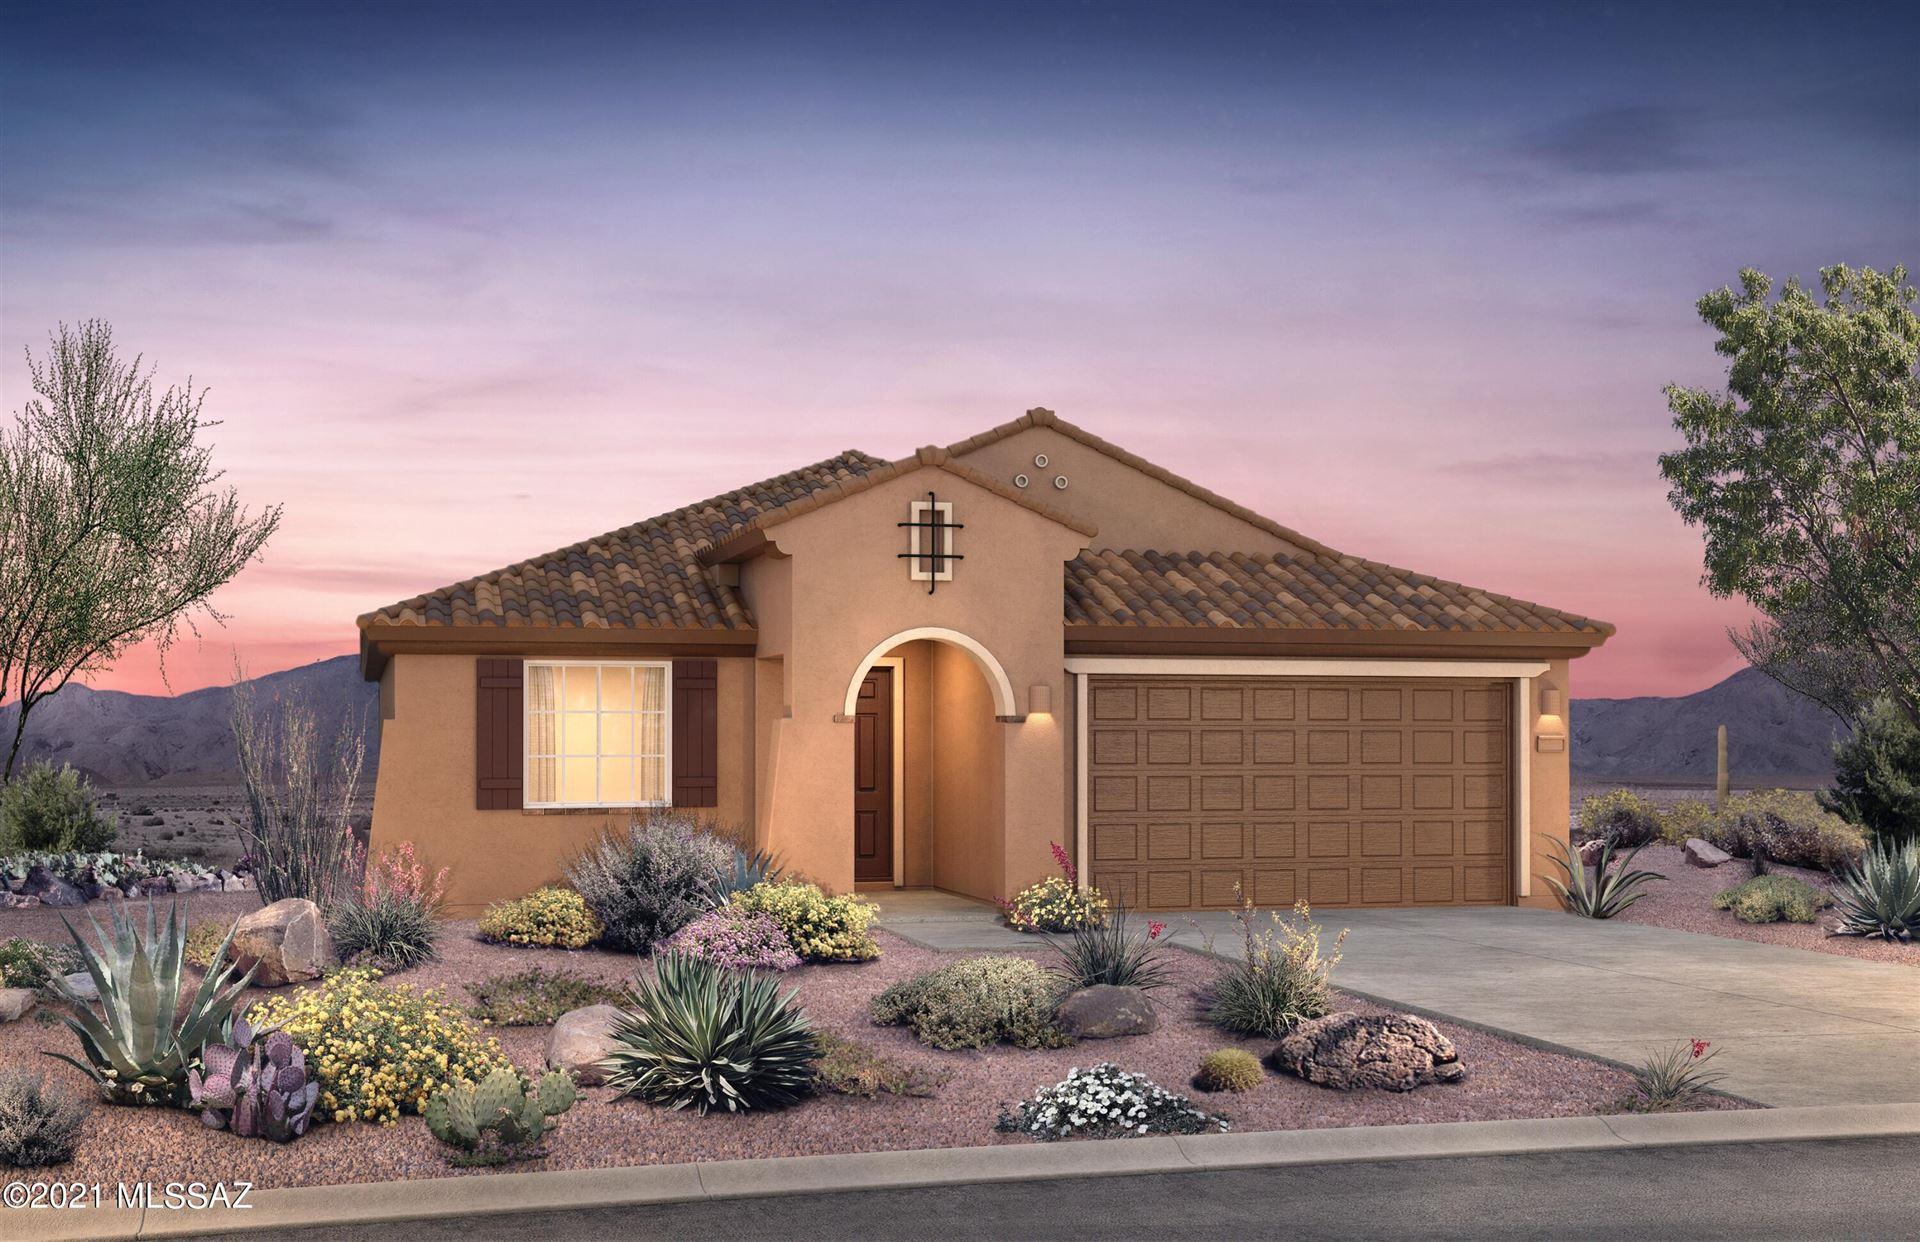 8270 W Spaulding W Street, Tucson, AZ 85743 - MLS#: 22108534